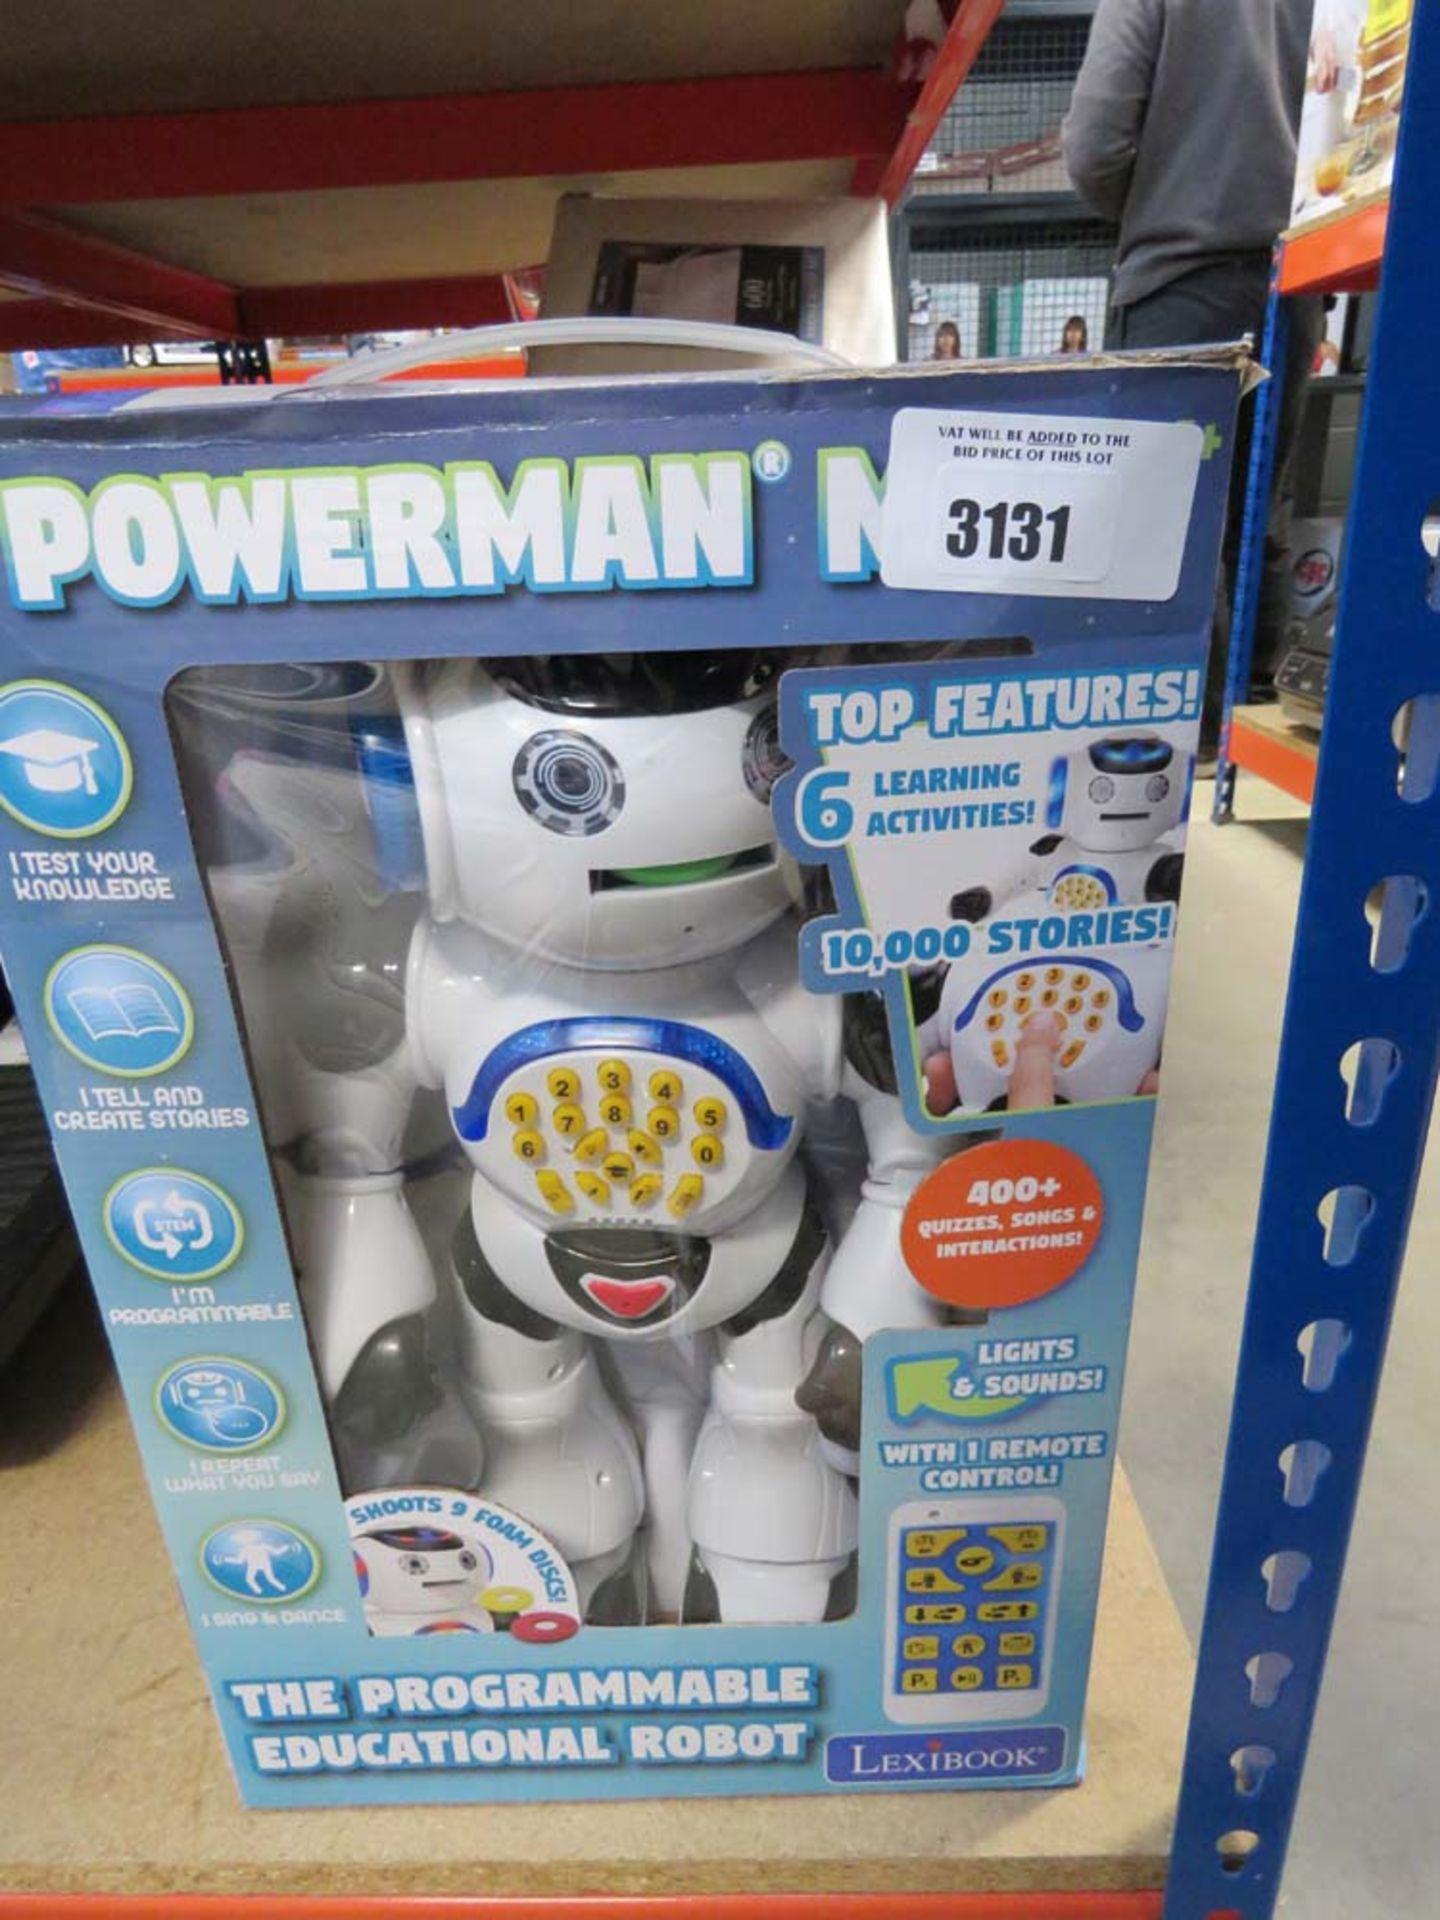 4 Powermax robots - Image 3 of 3